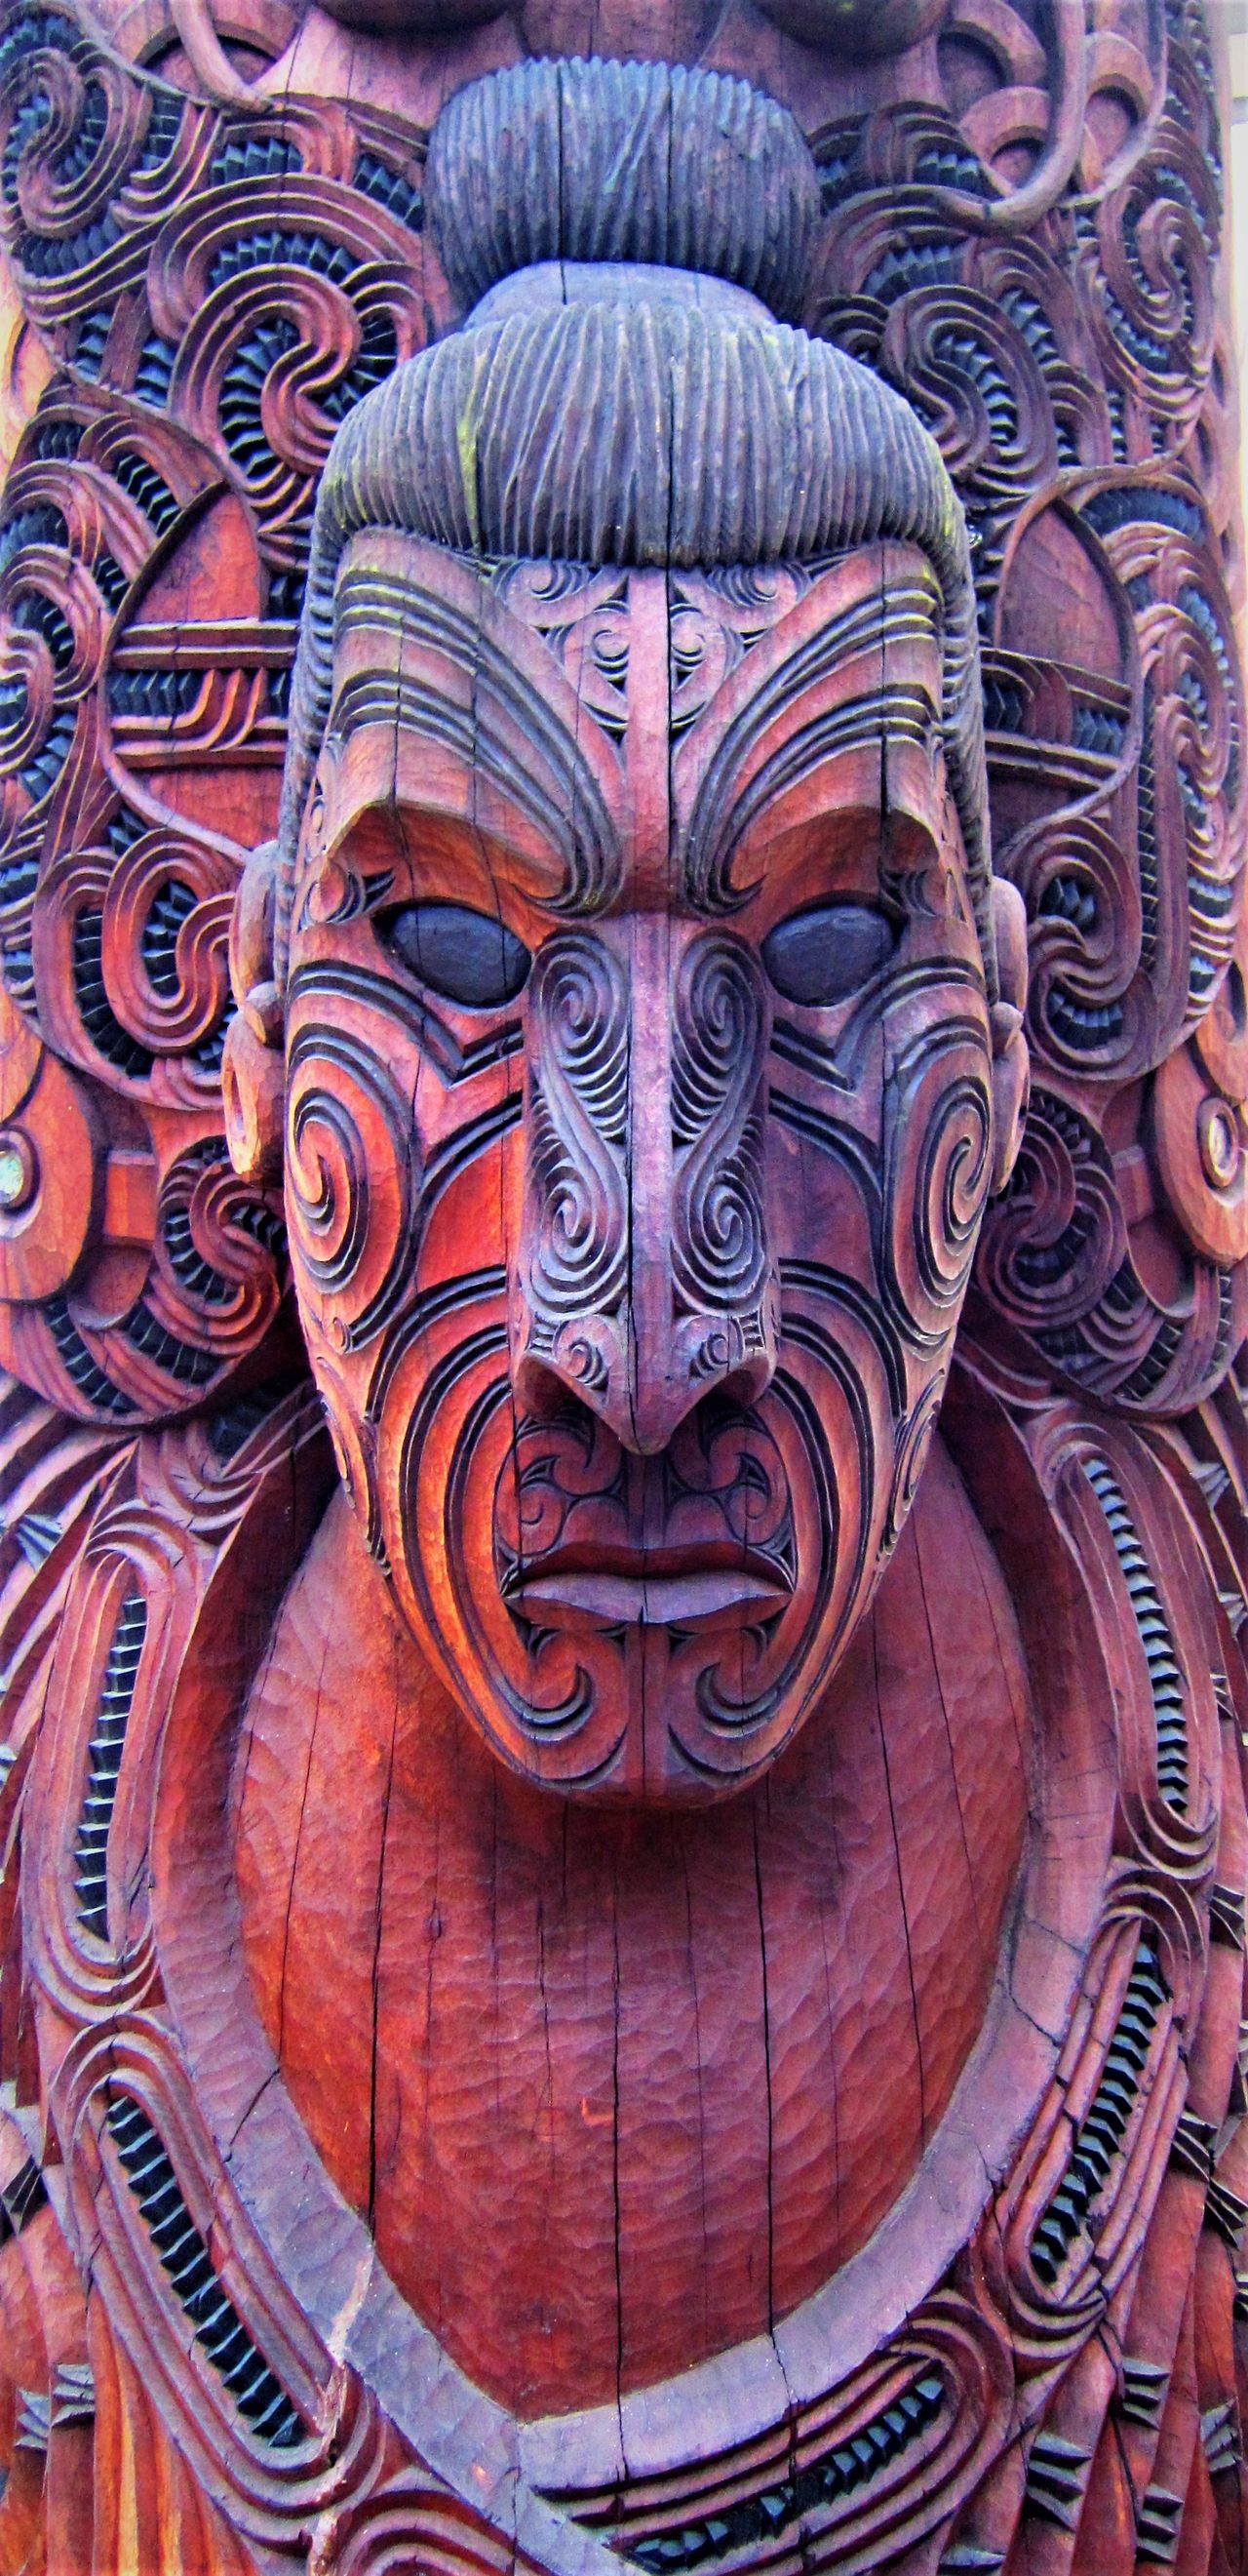 Traditional Maori Art: Maori Art